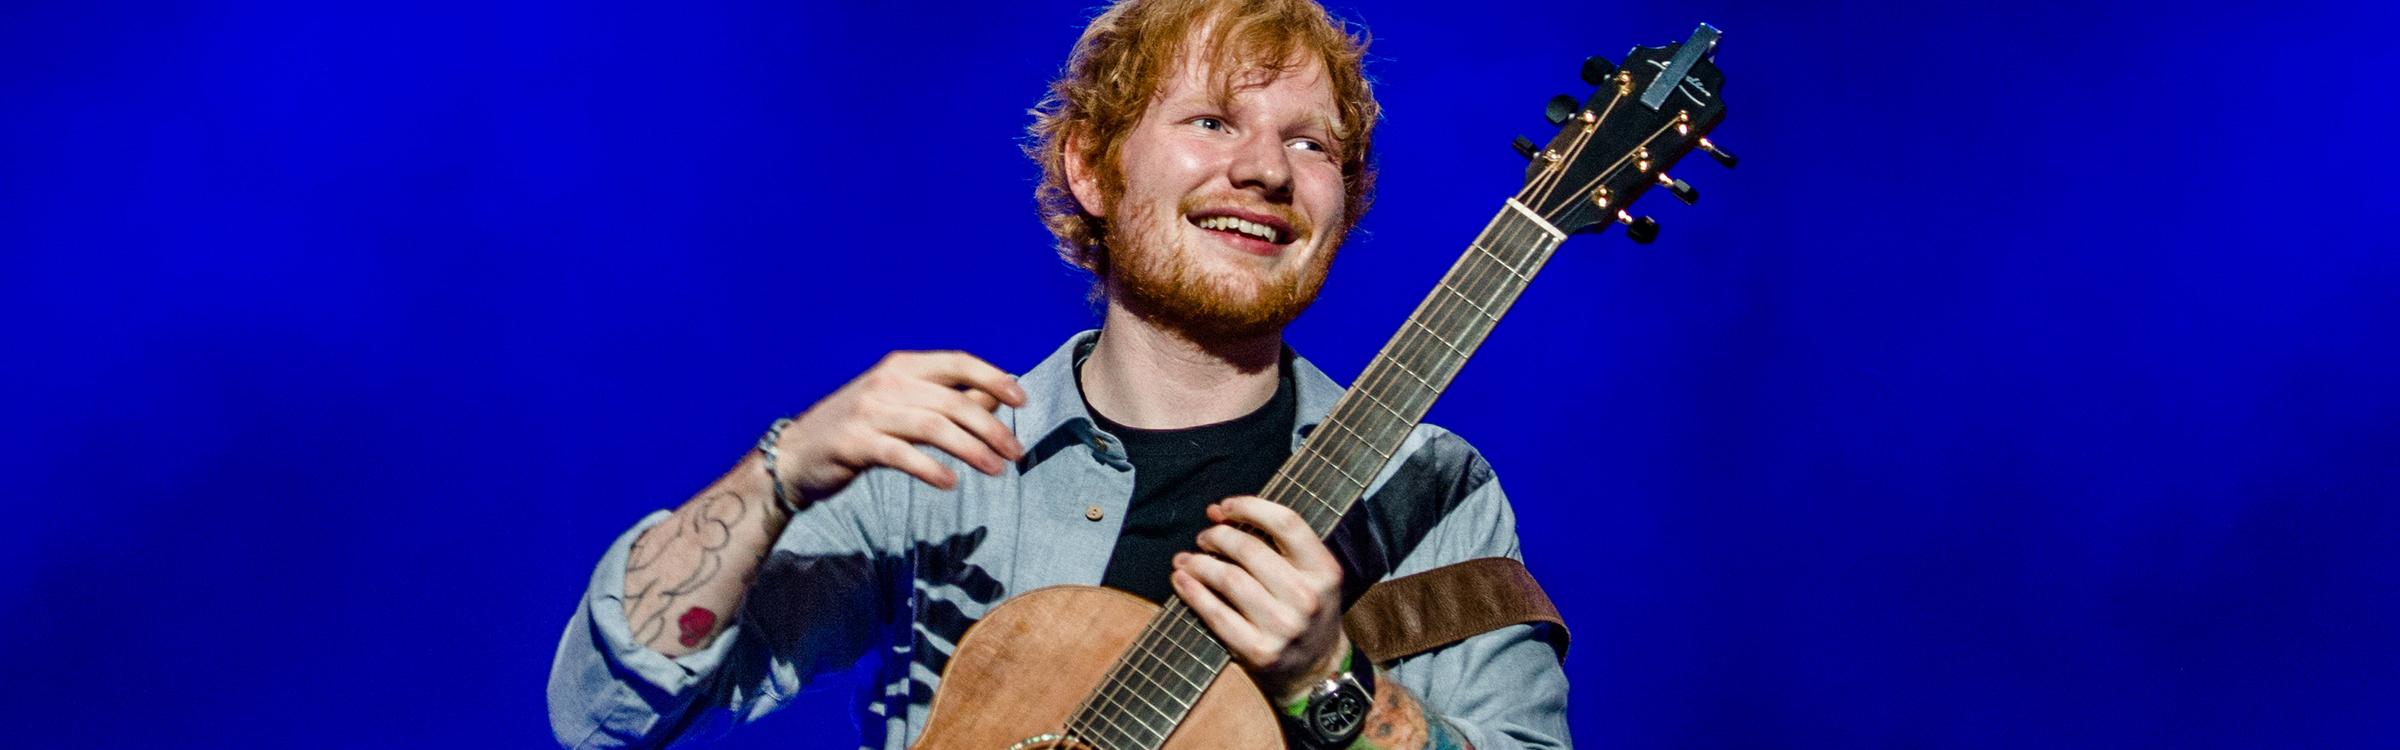 Ed headeraf gitaar